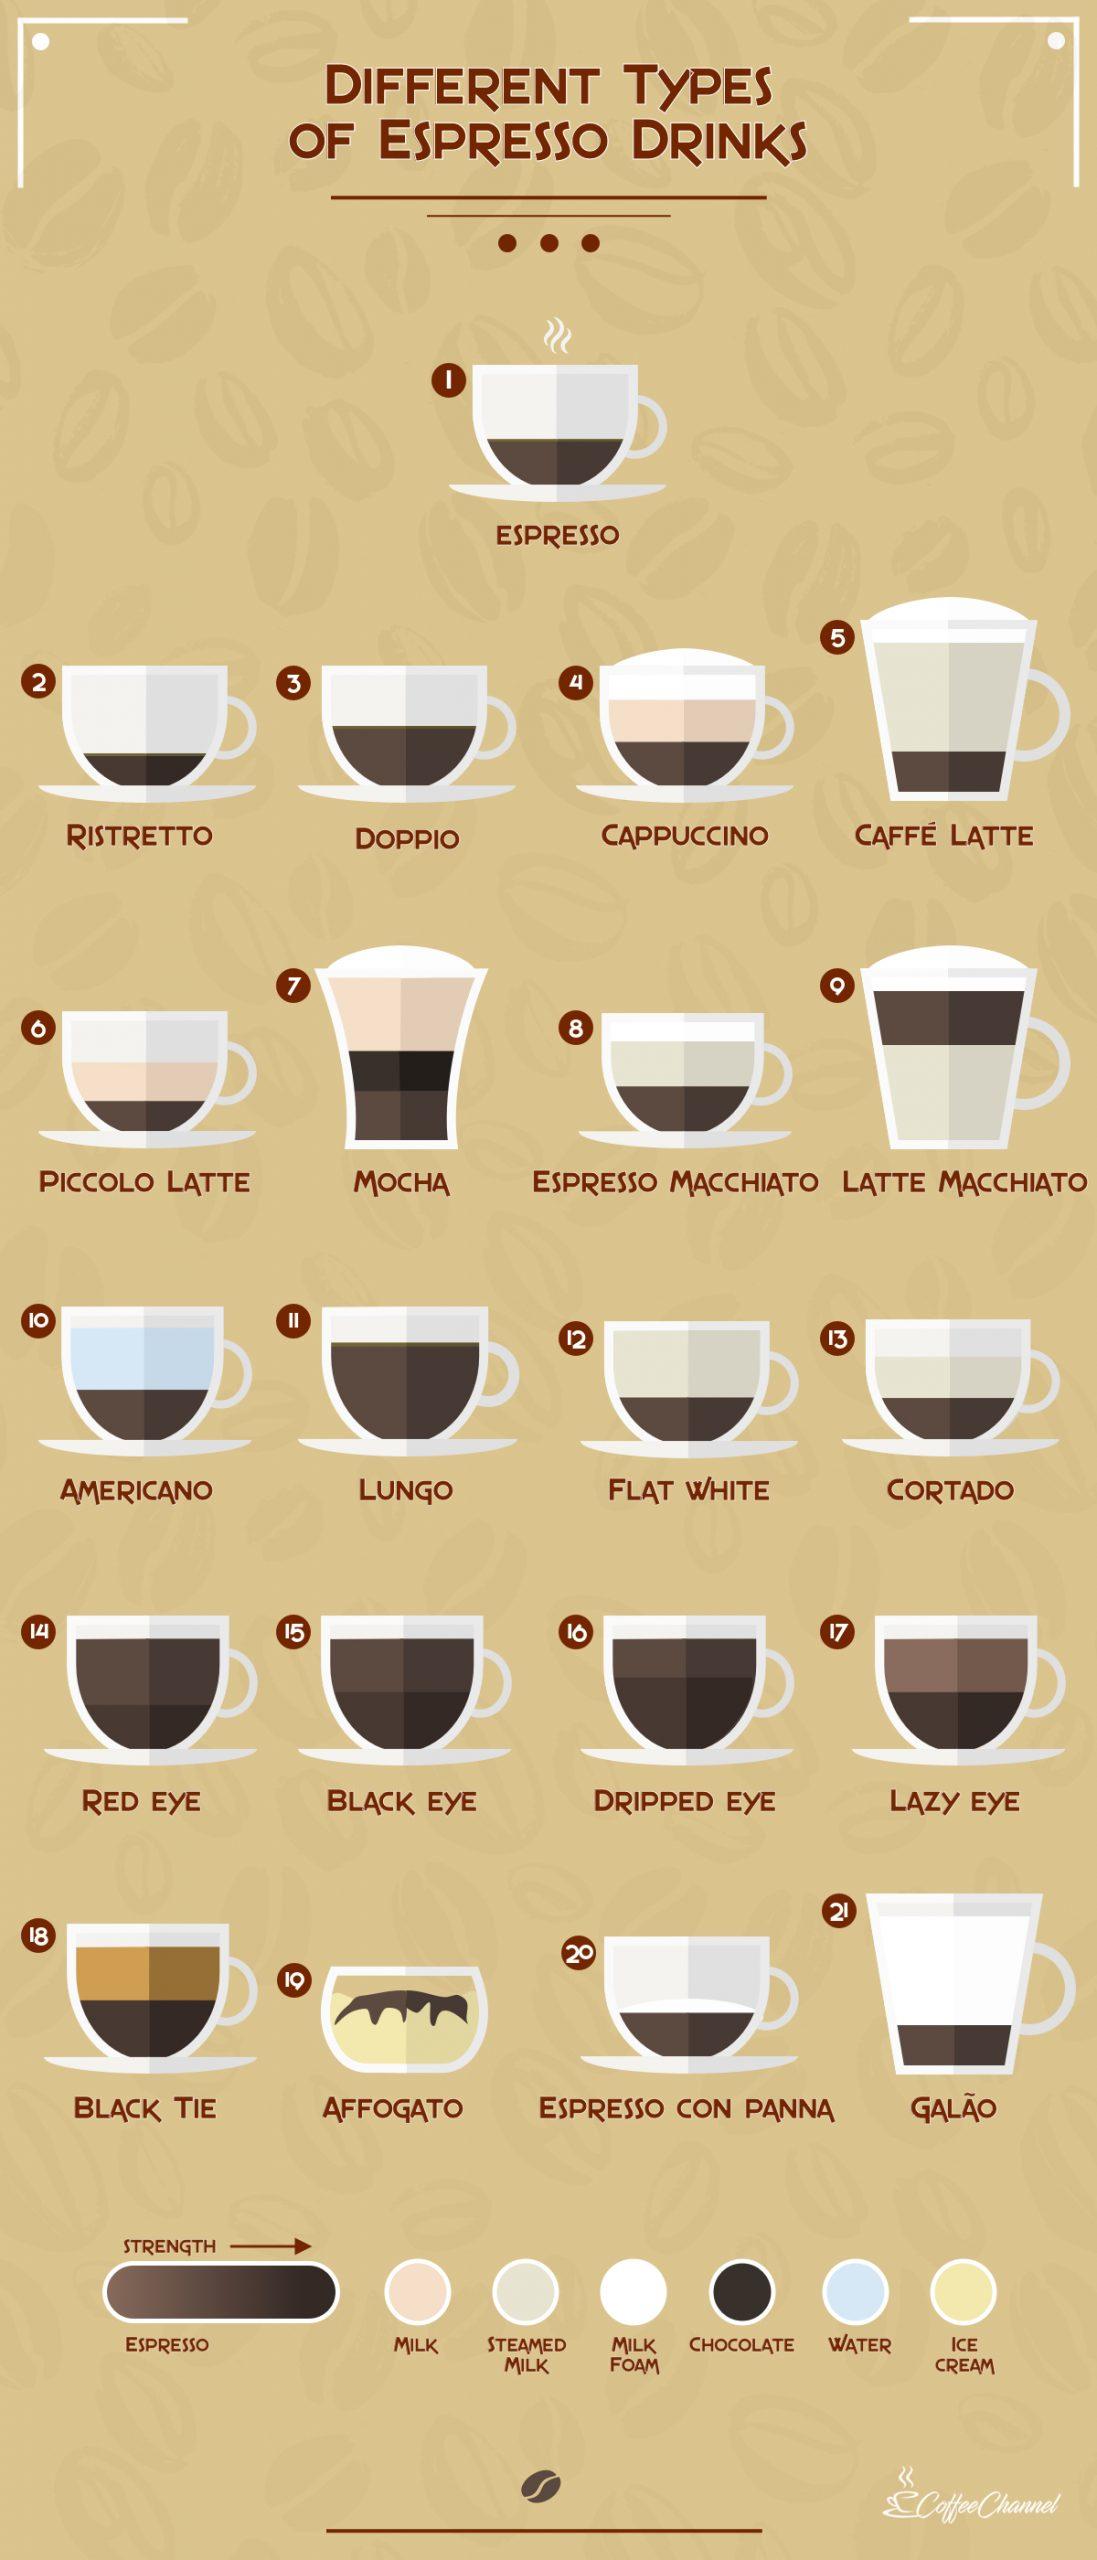 different types of espresso drinks